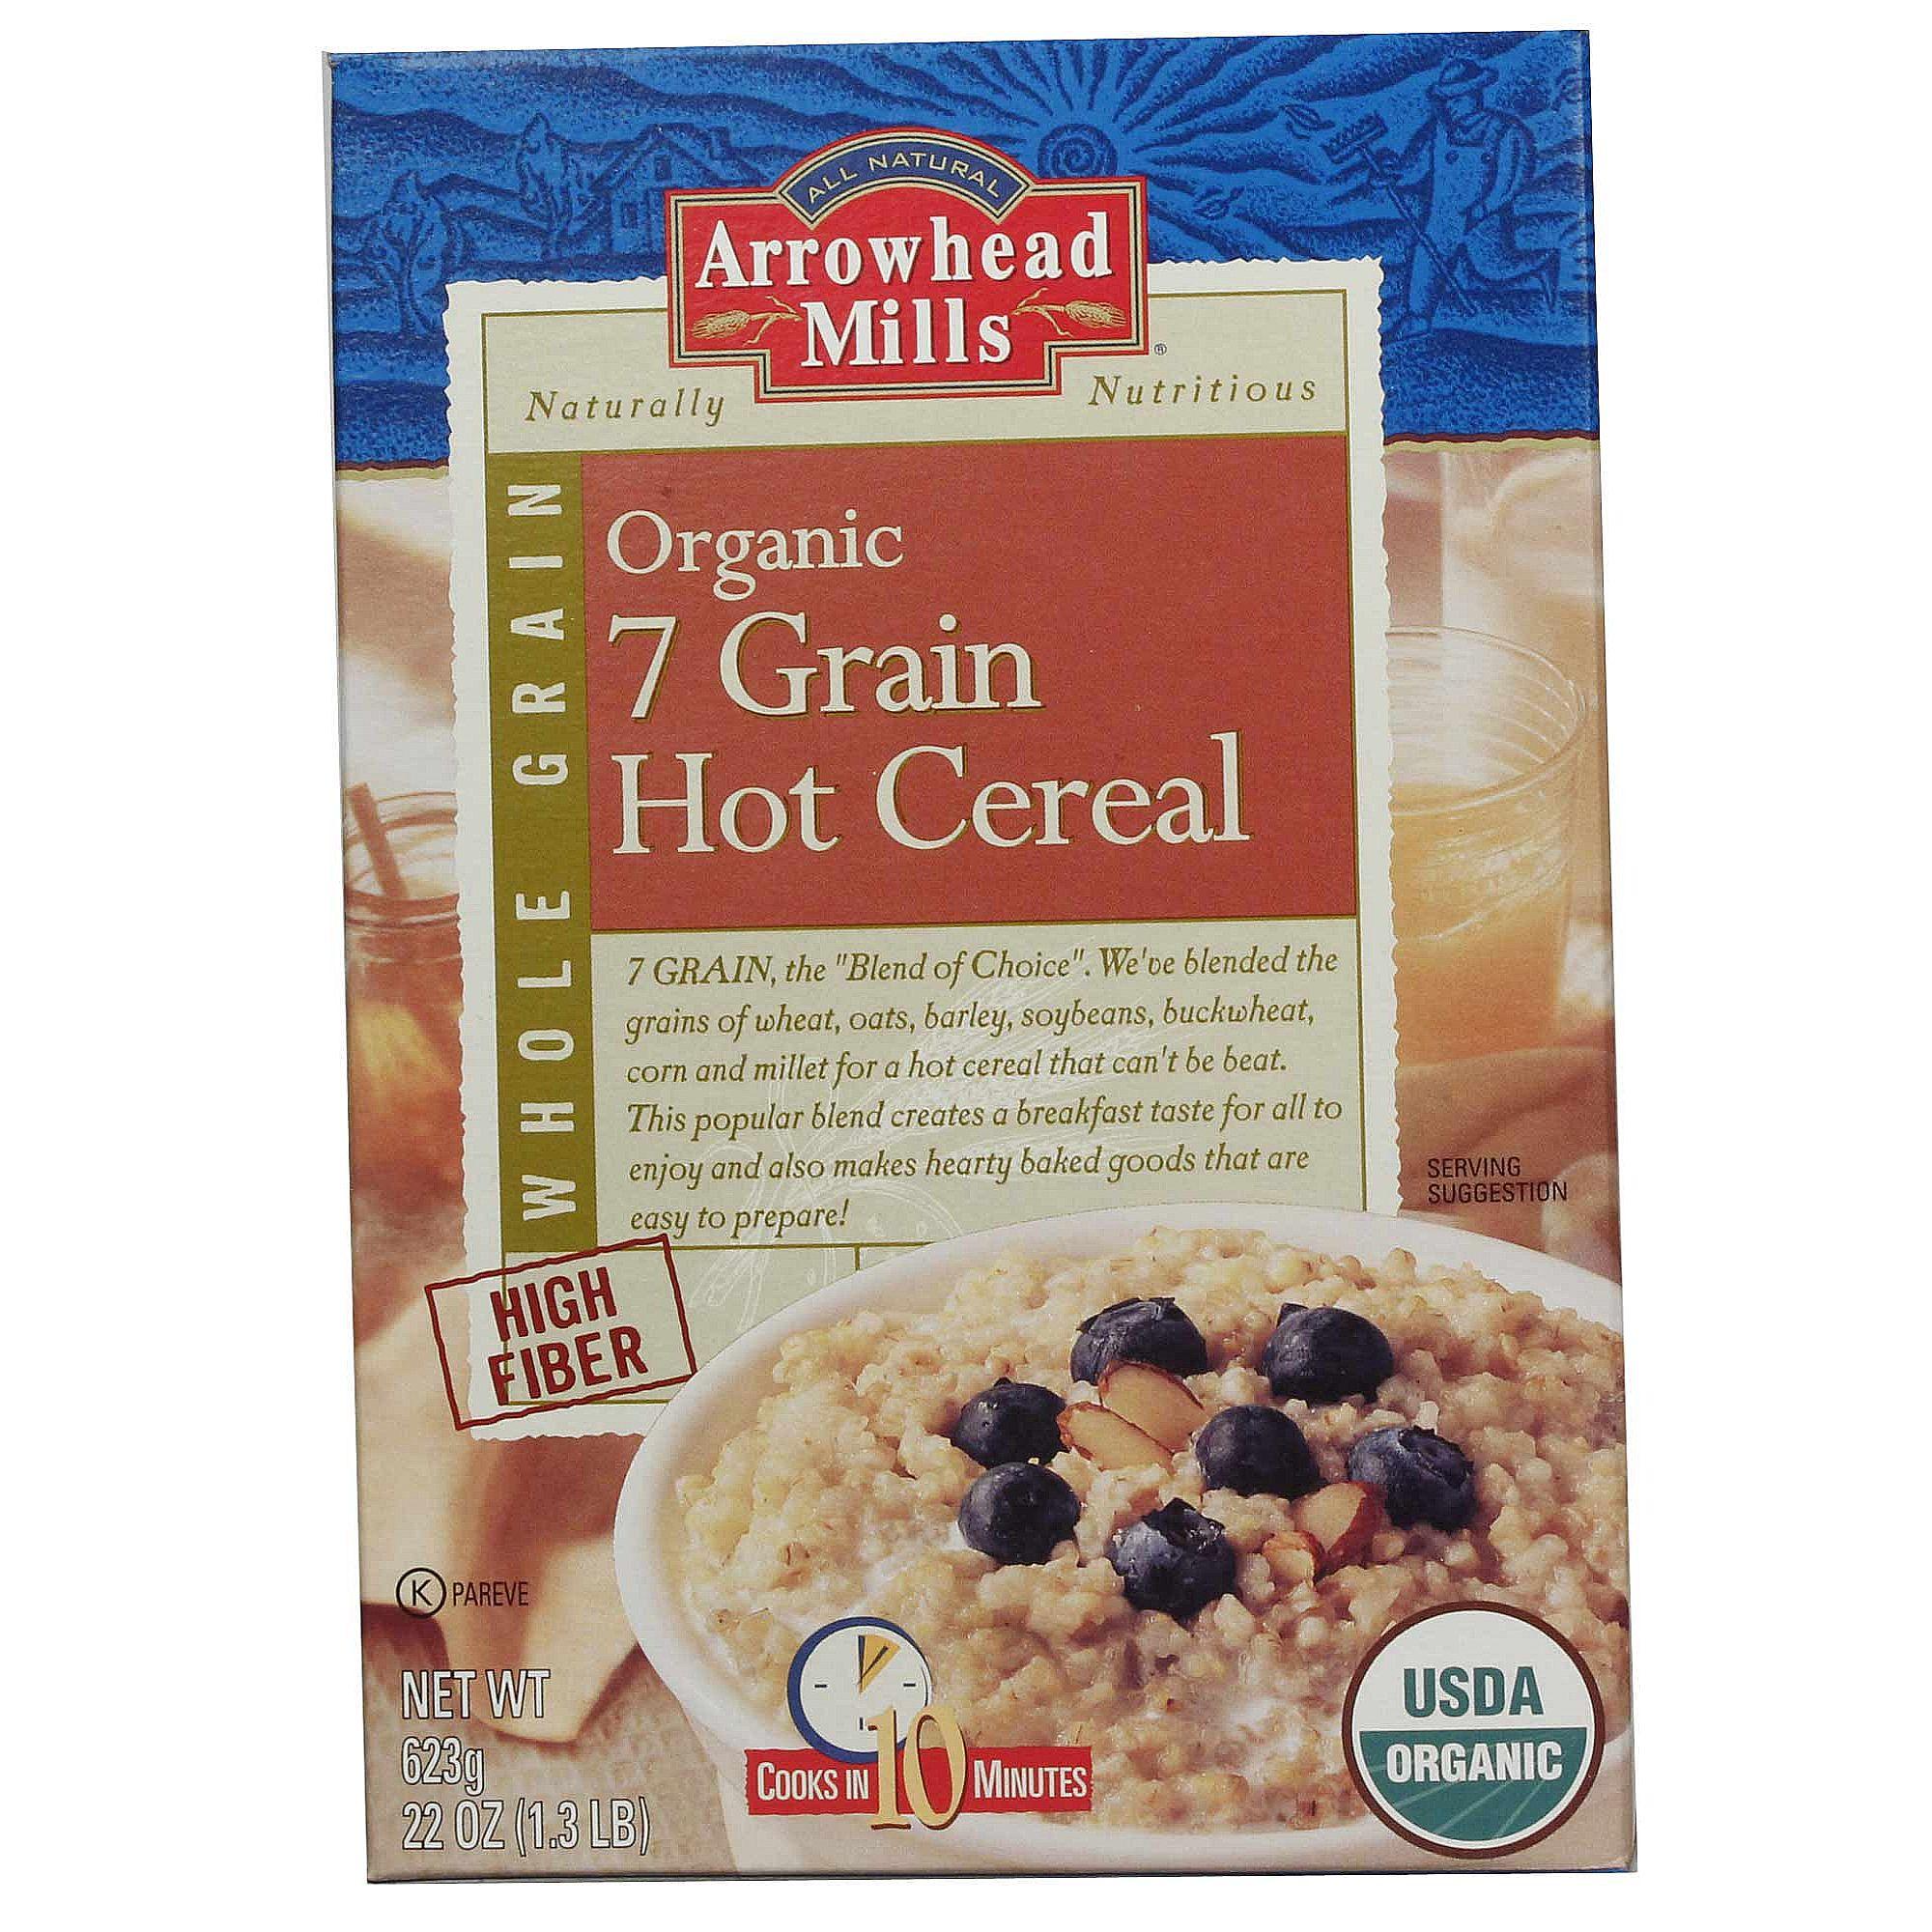 Arrowhead mills organic 7 grain hot cereal 22oz box evitamins organic 7 grain hot cereal hover to zoom ccuart Choice Image